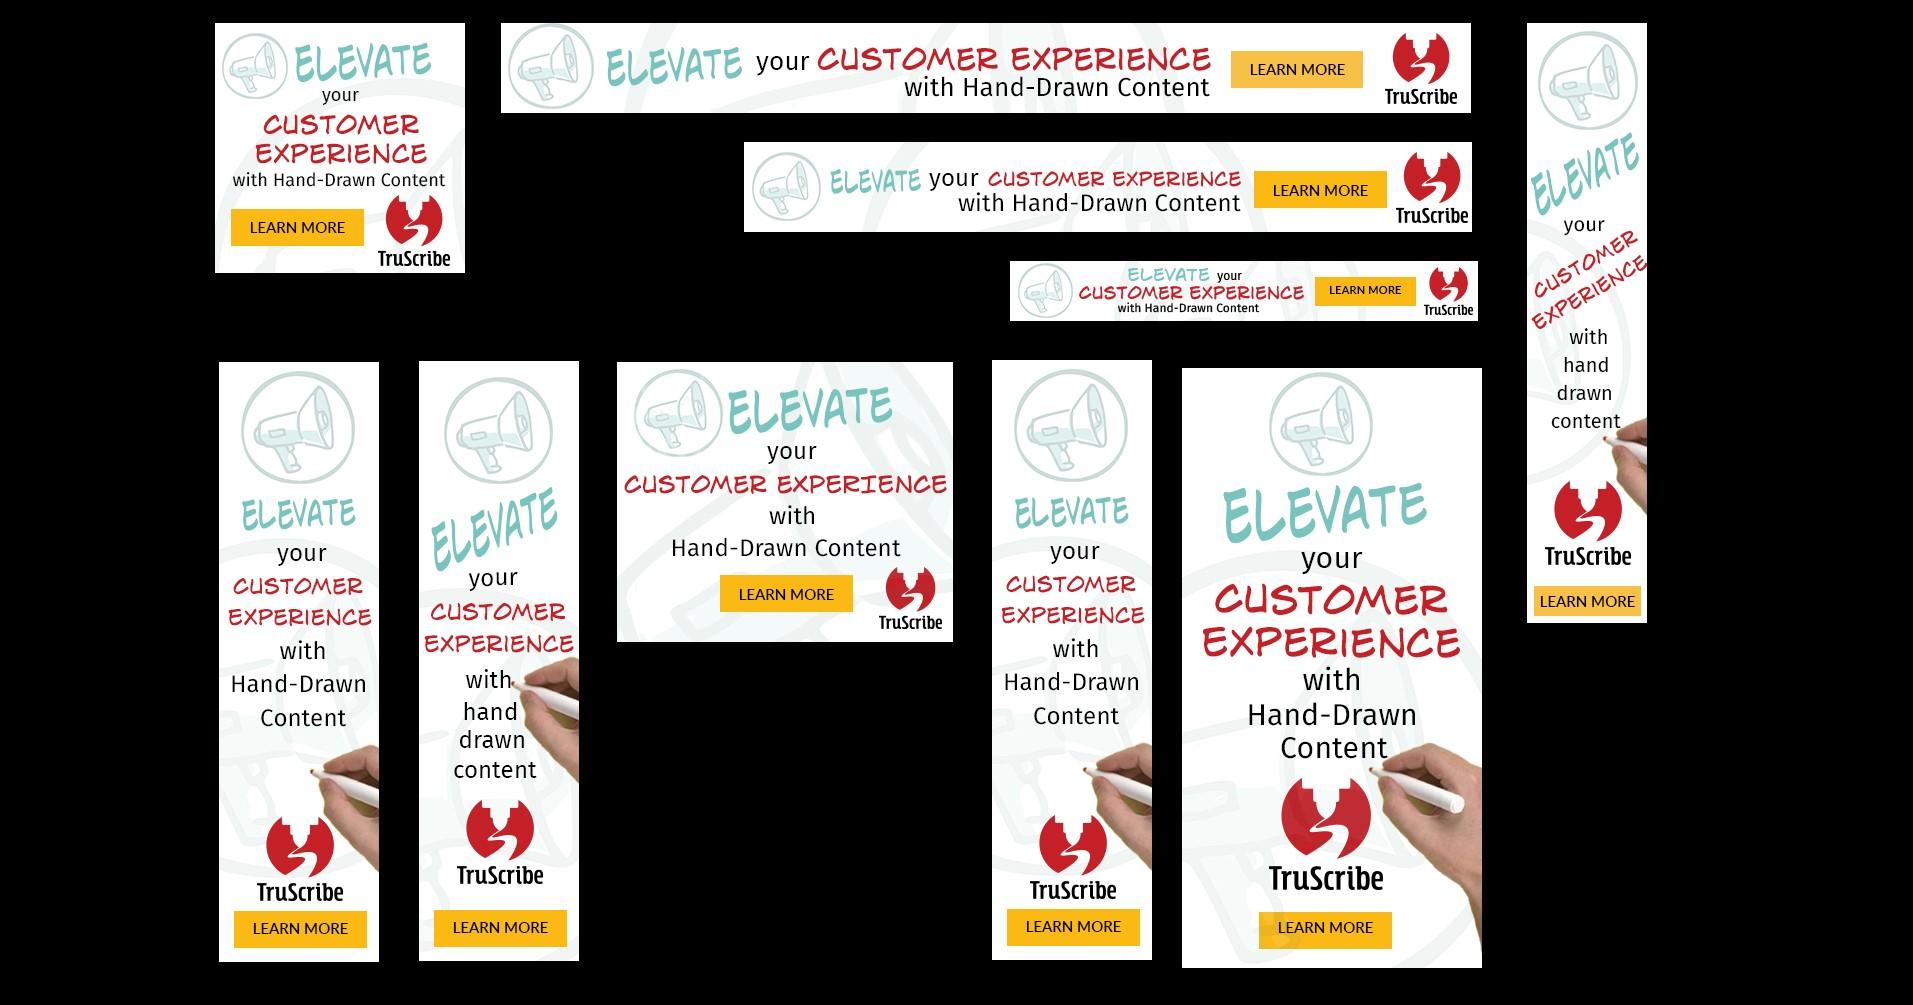 Customer Experience mockup